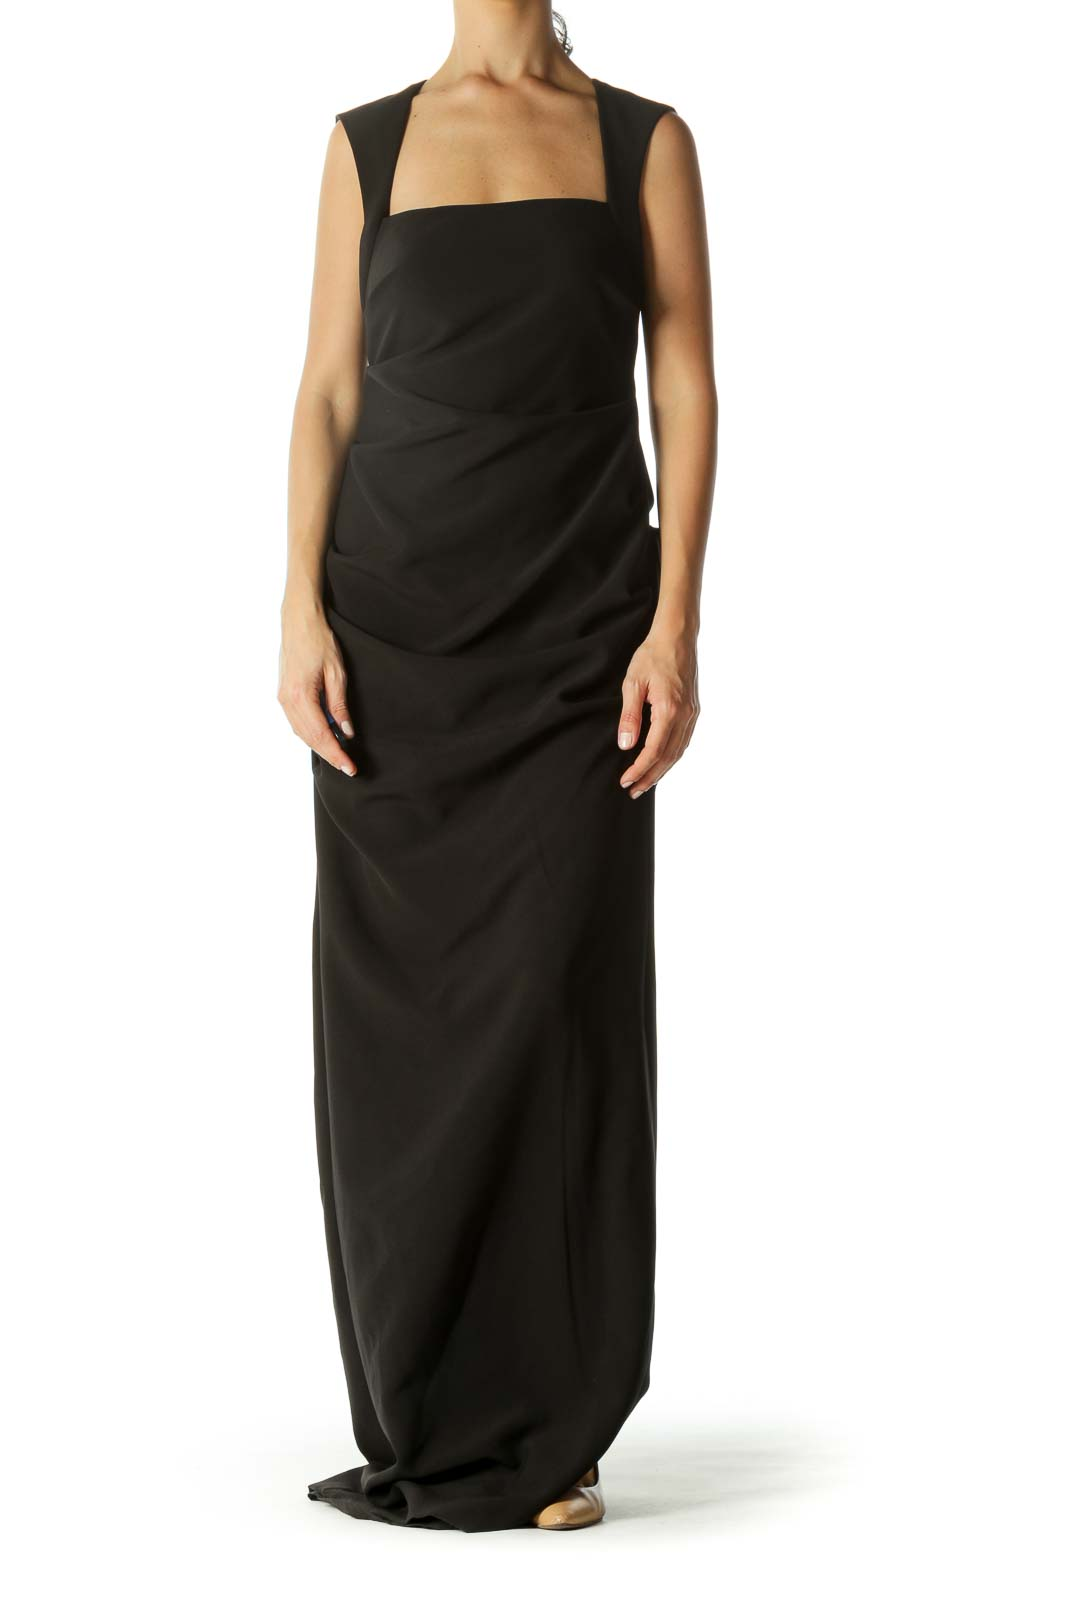 Black Square Neck With Open Back Ruched Slit Evening Dress